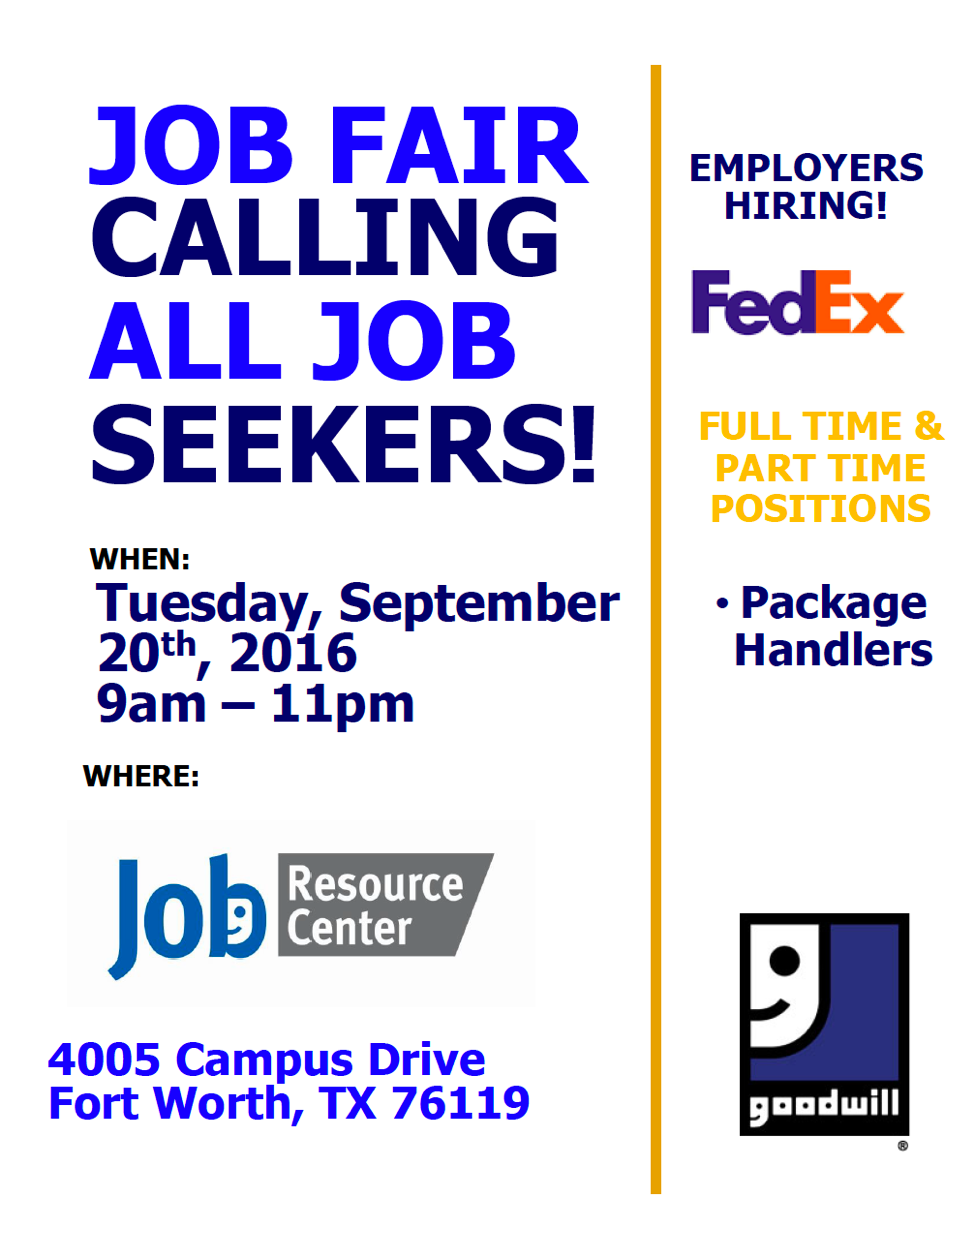 Goodwill Job Fair!